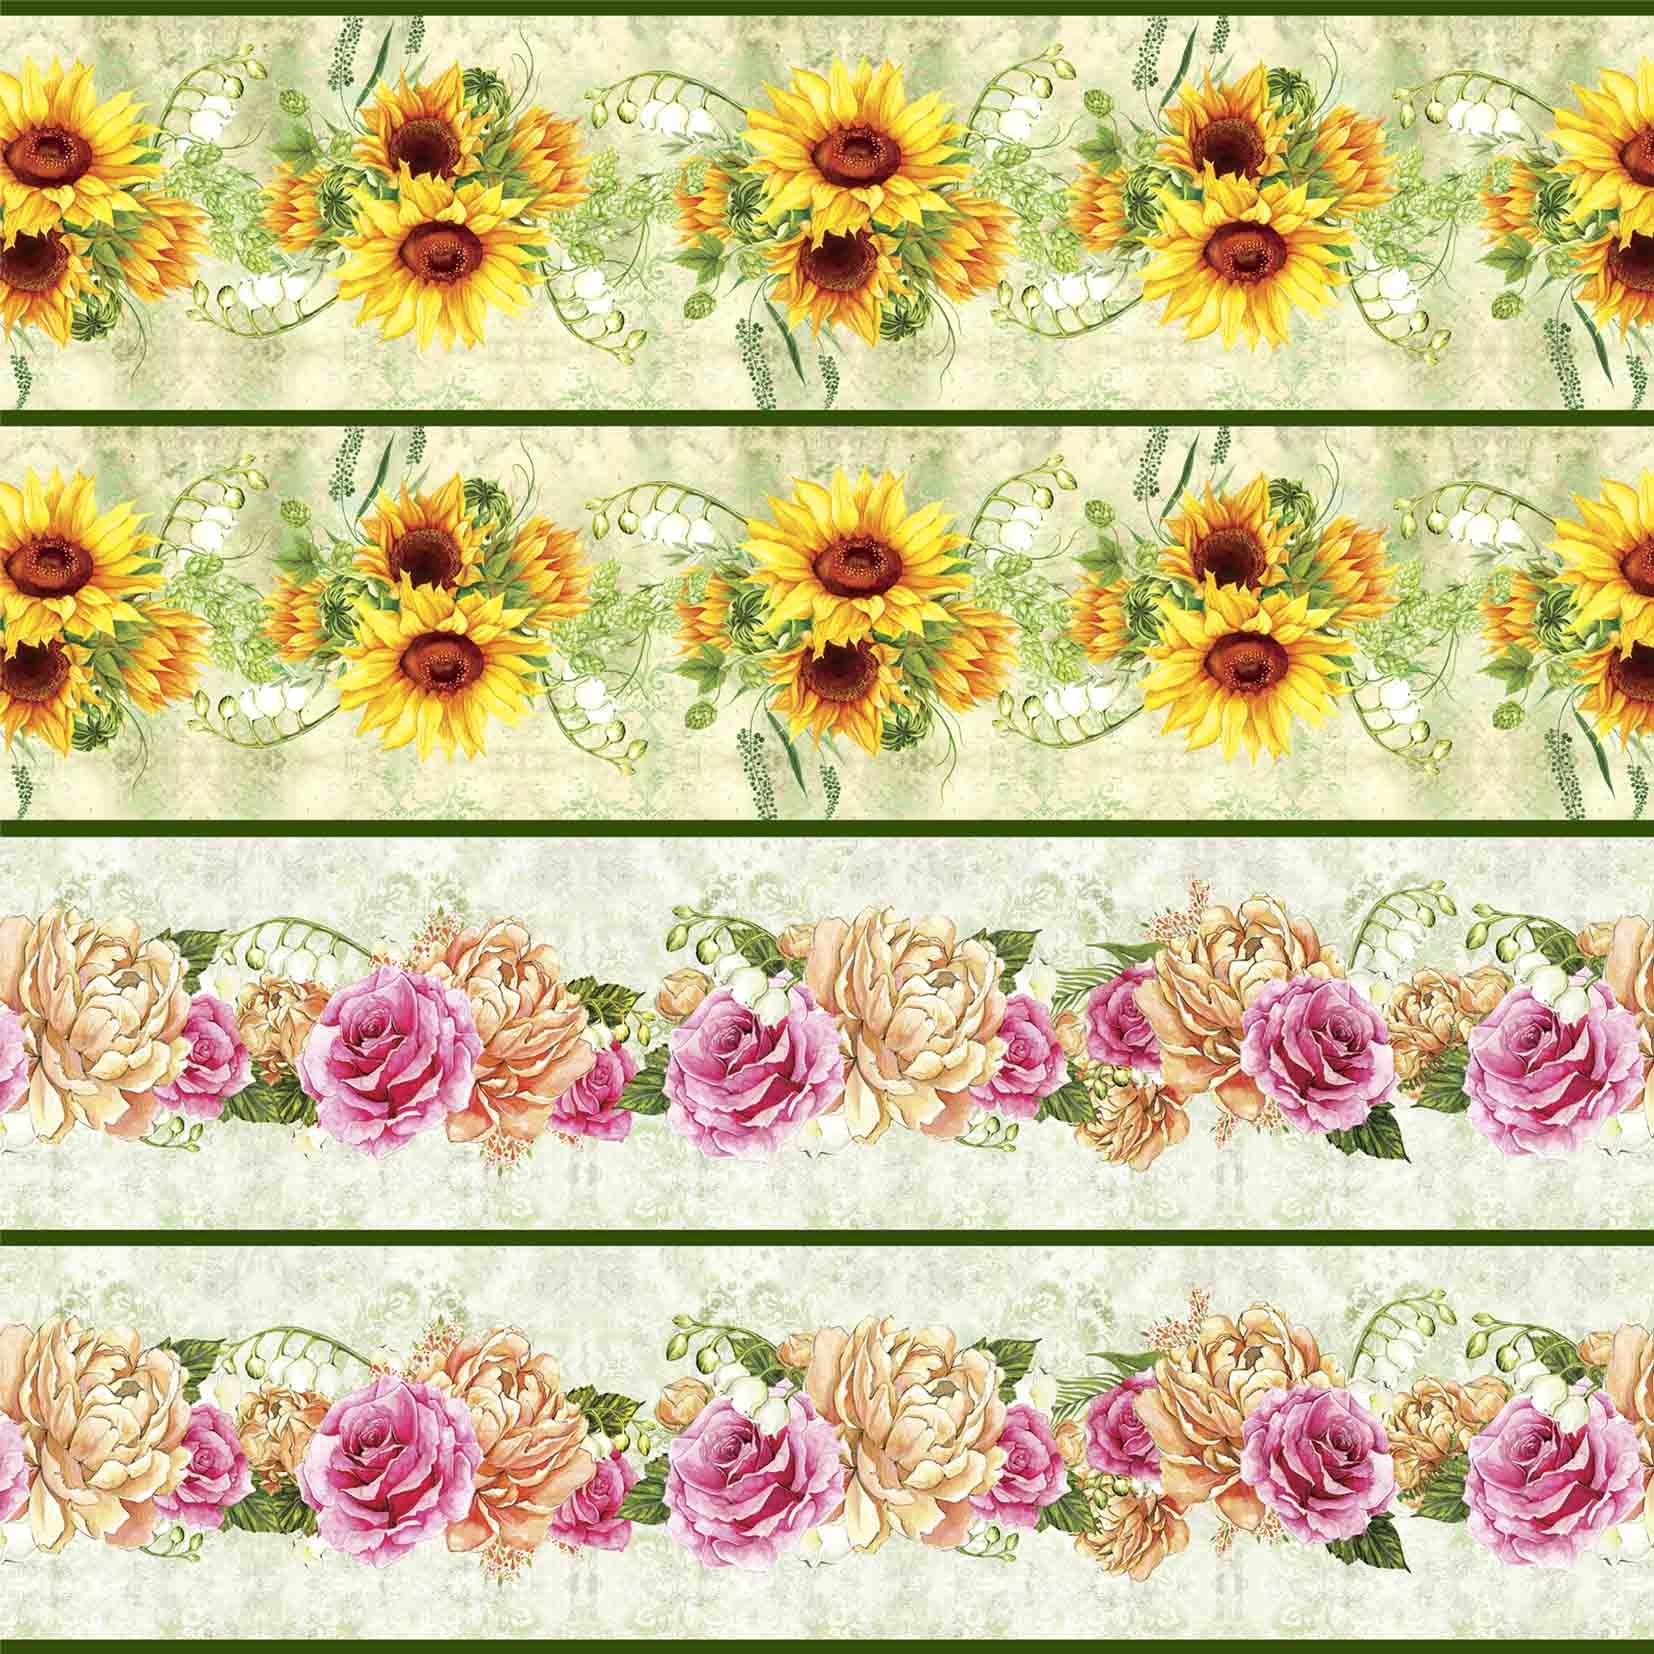 Faixa Floral III - Girassol